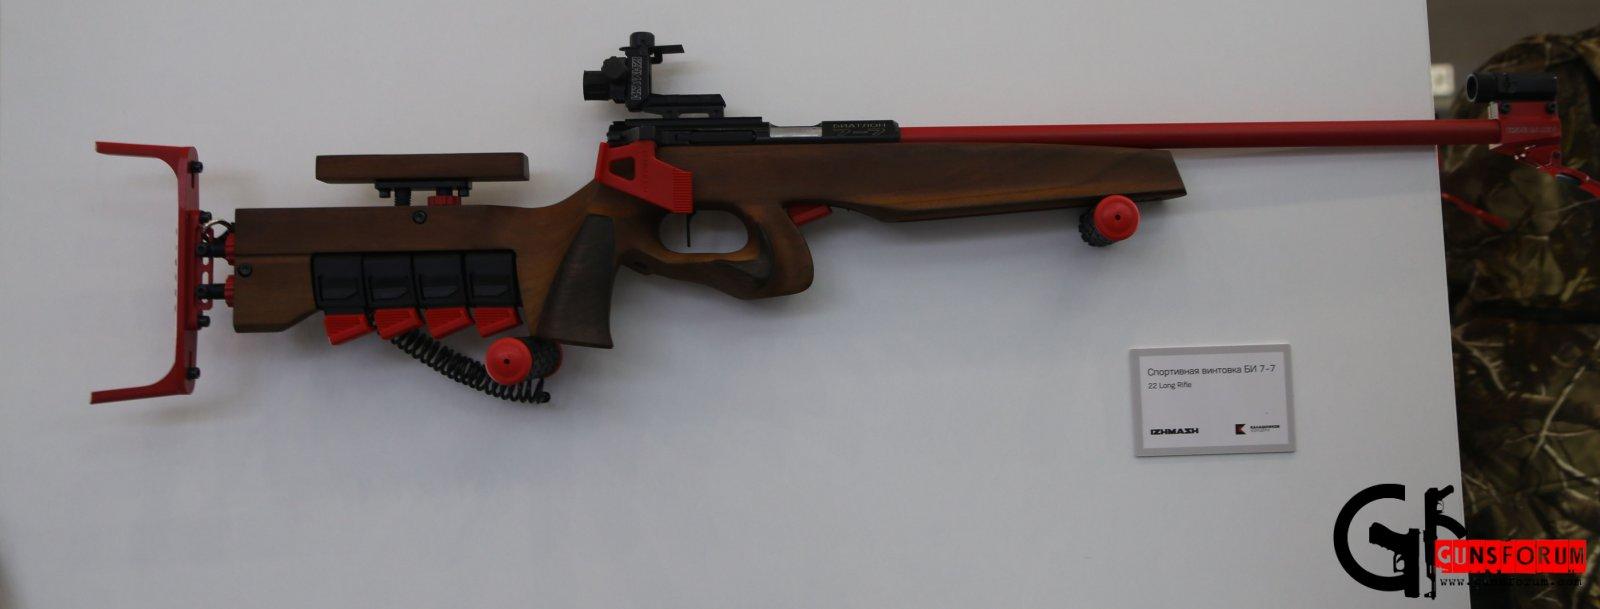 Спортивная винтовка Би 7-7 в калибре .22lr